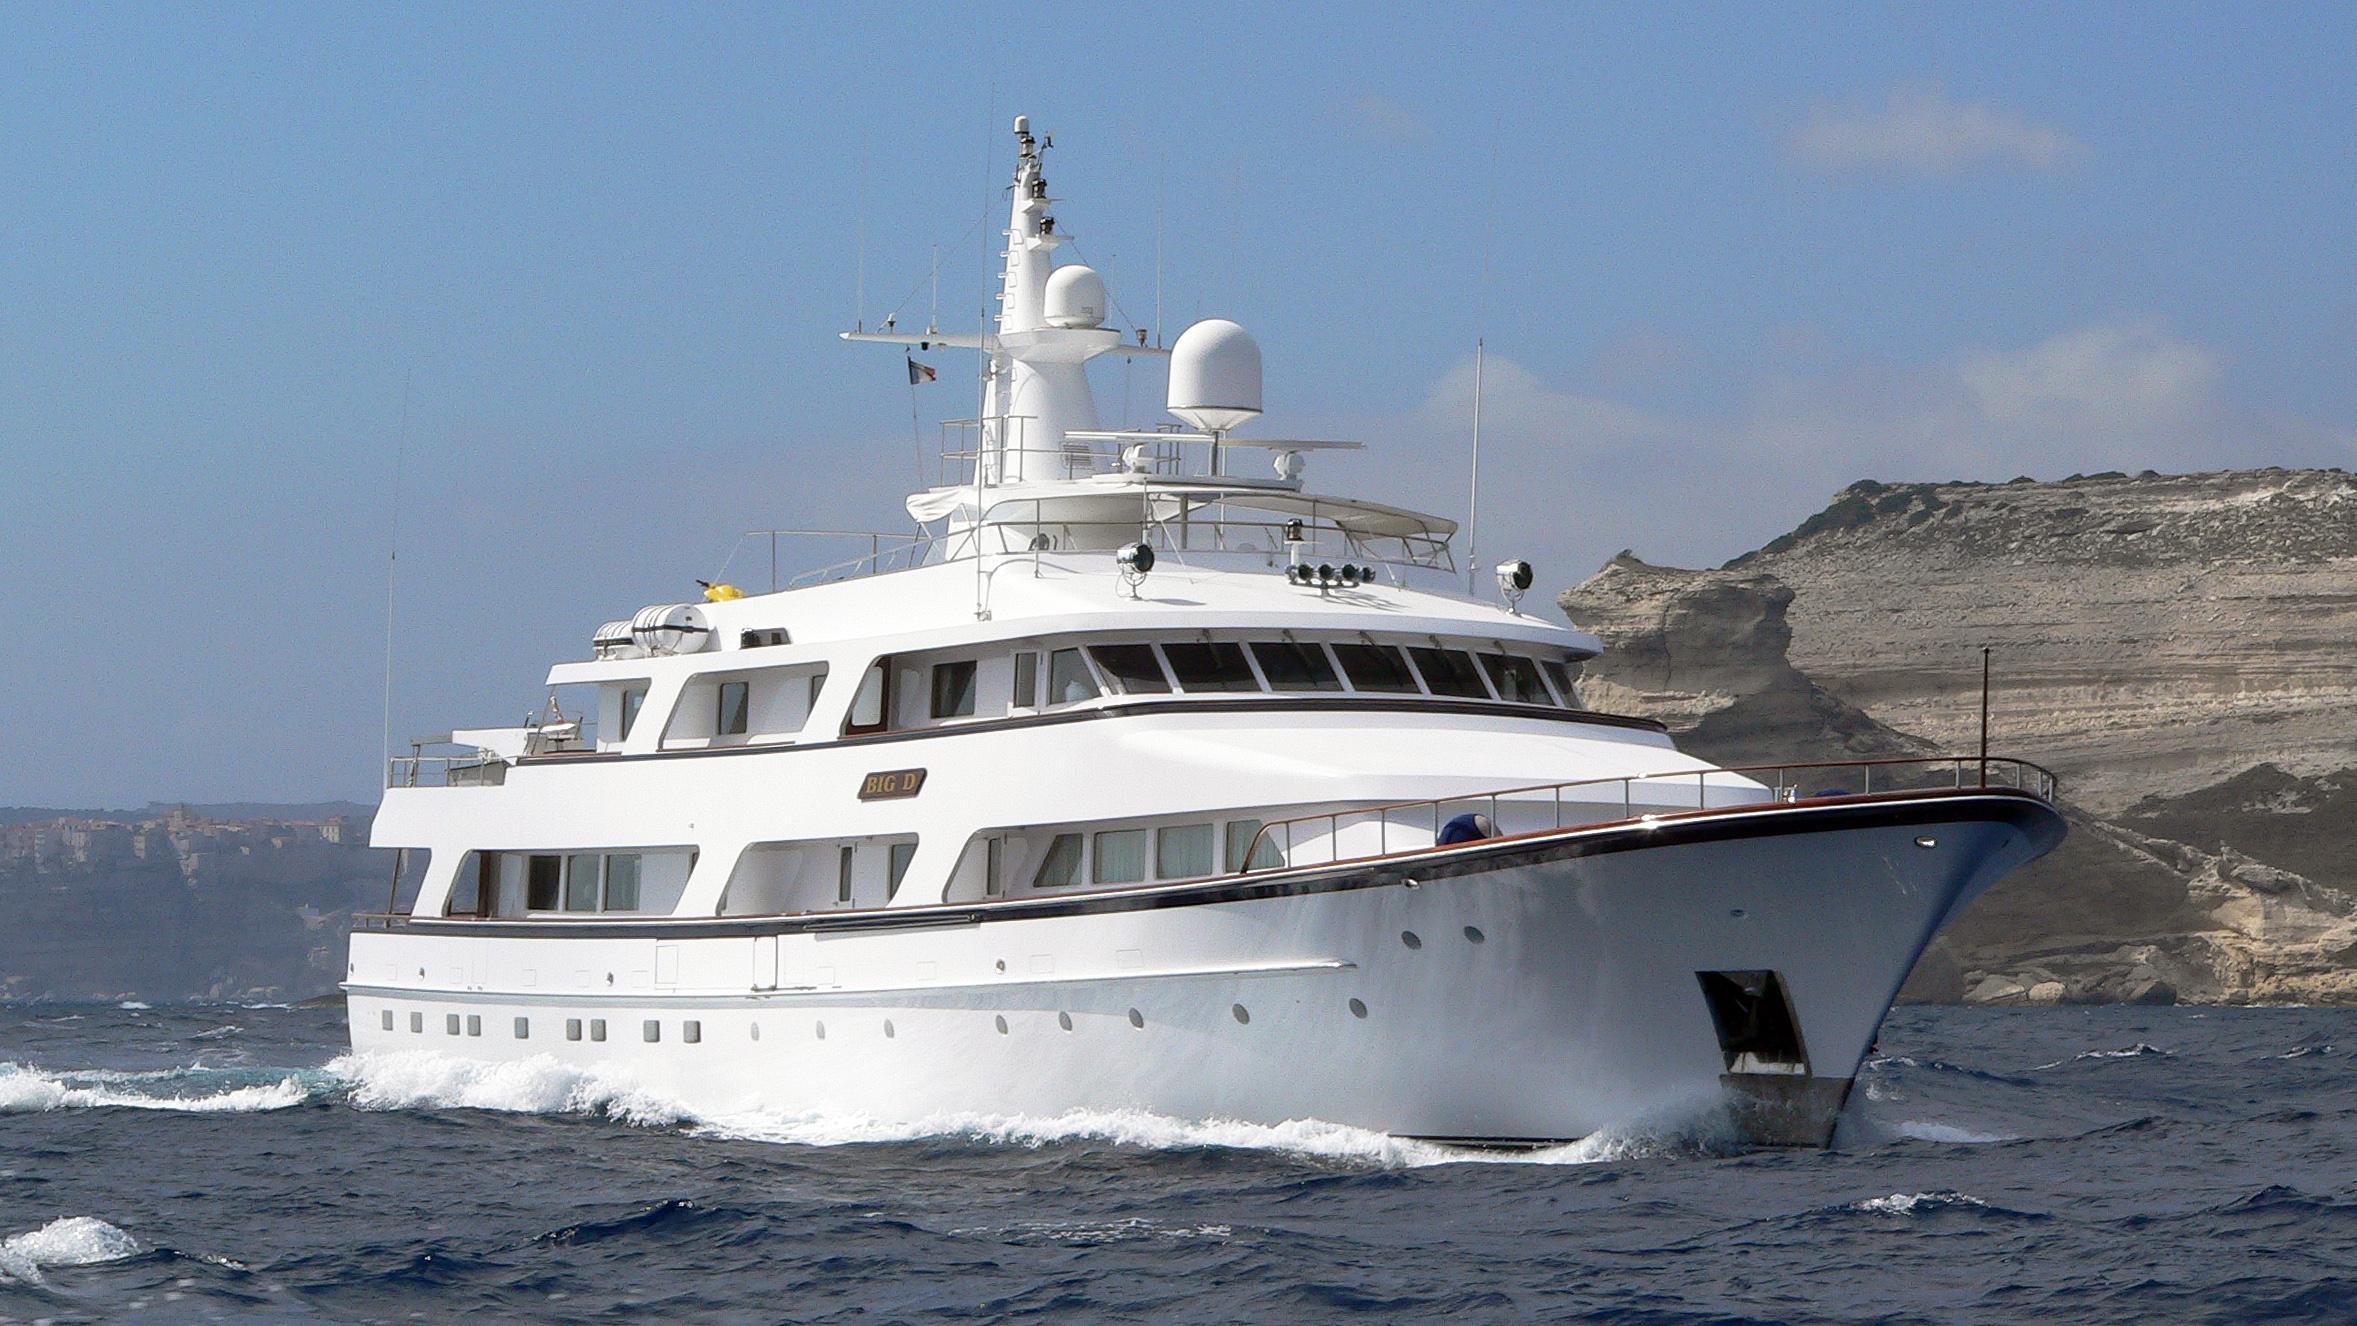 lady-rose-motor-yacht-hitachi-1986-45m-cruising-half-profile-before-refit